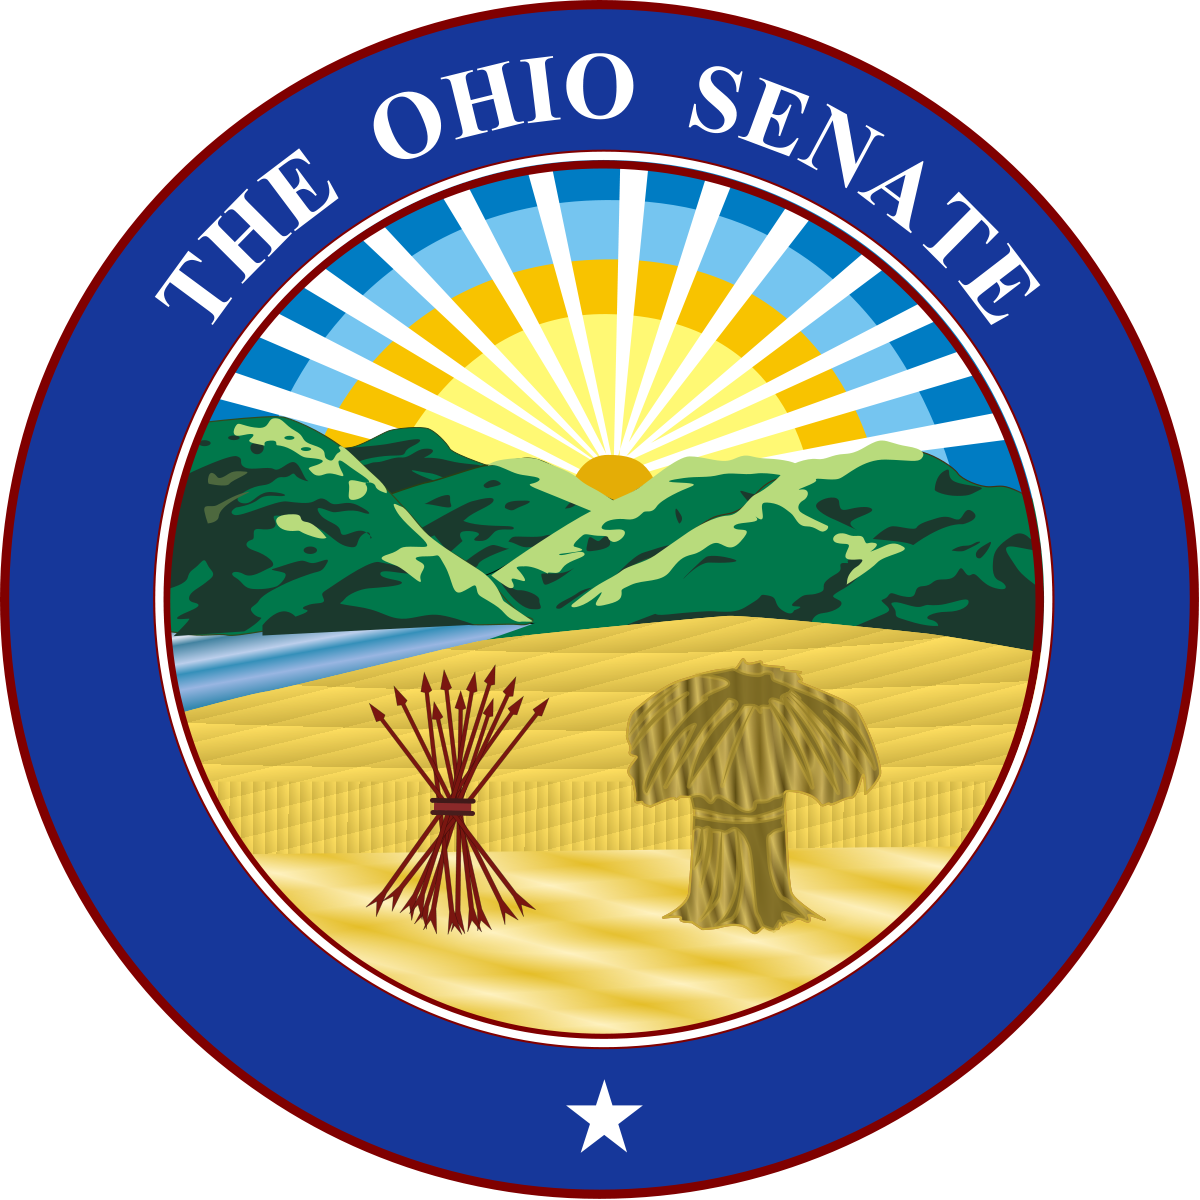 Leader clipart minority leader. Ohio senate wikipedia